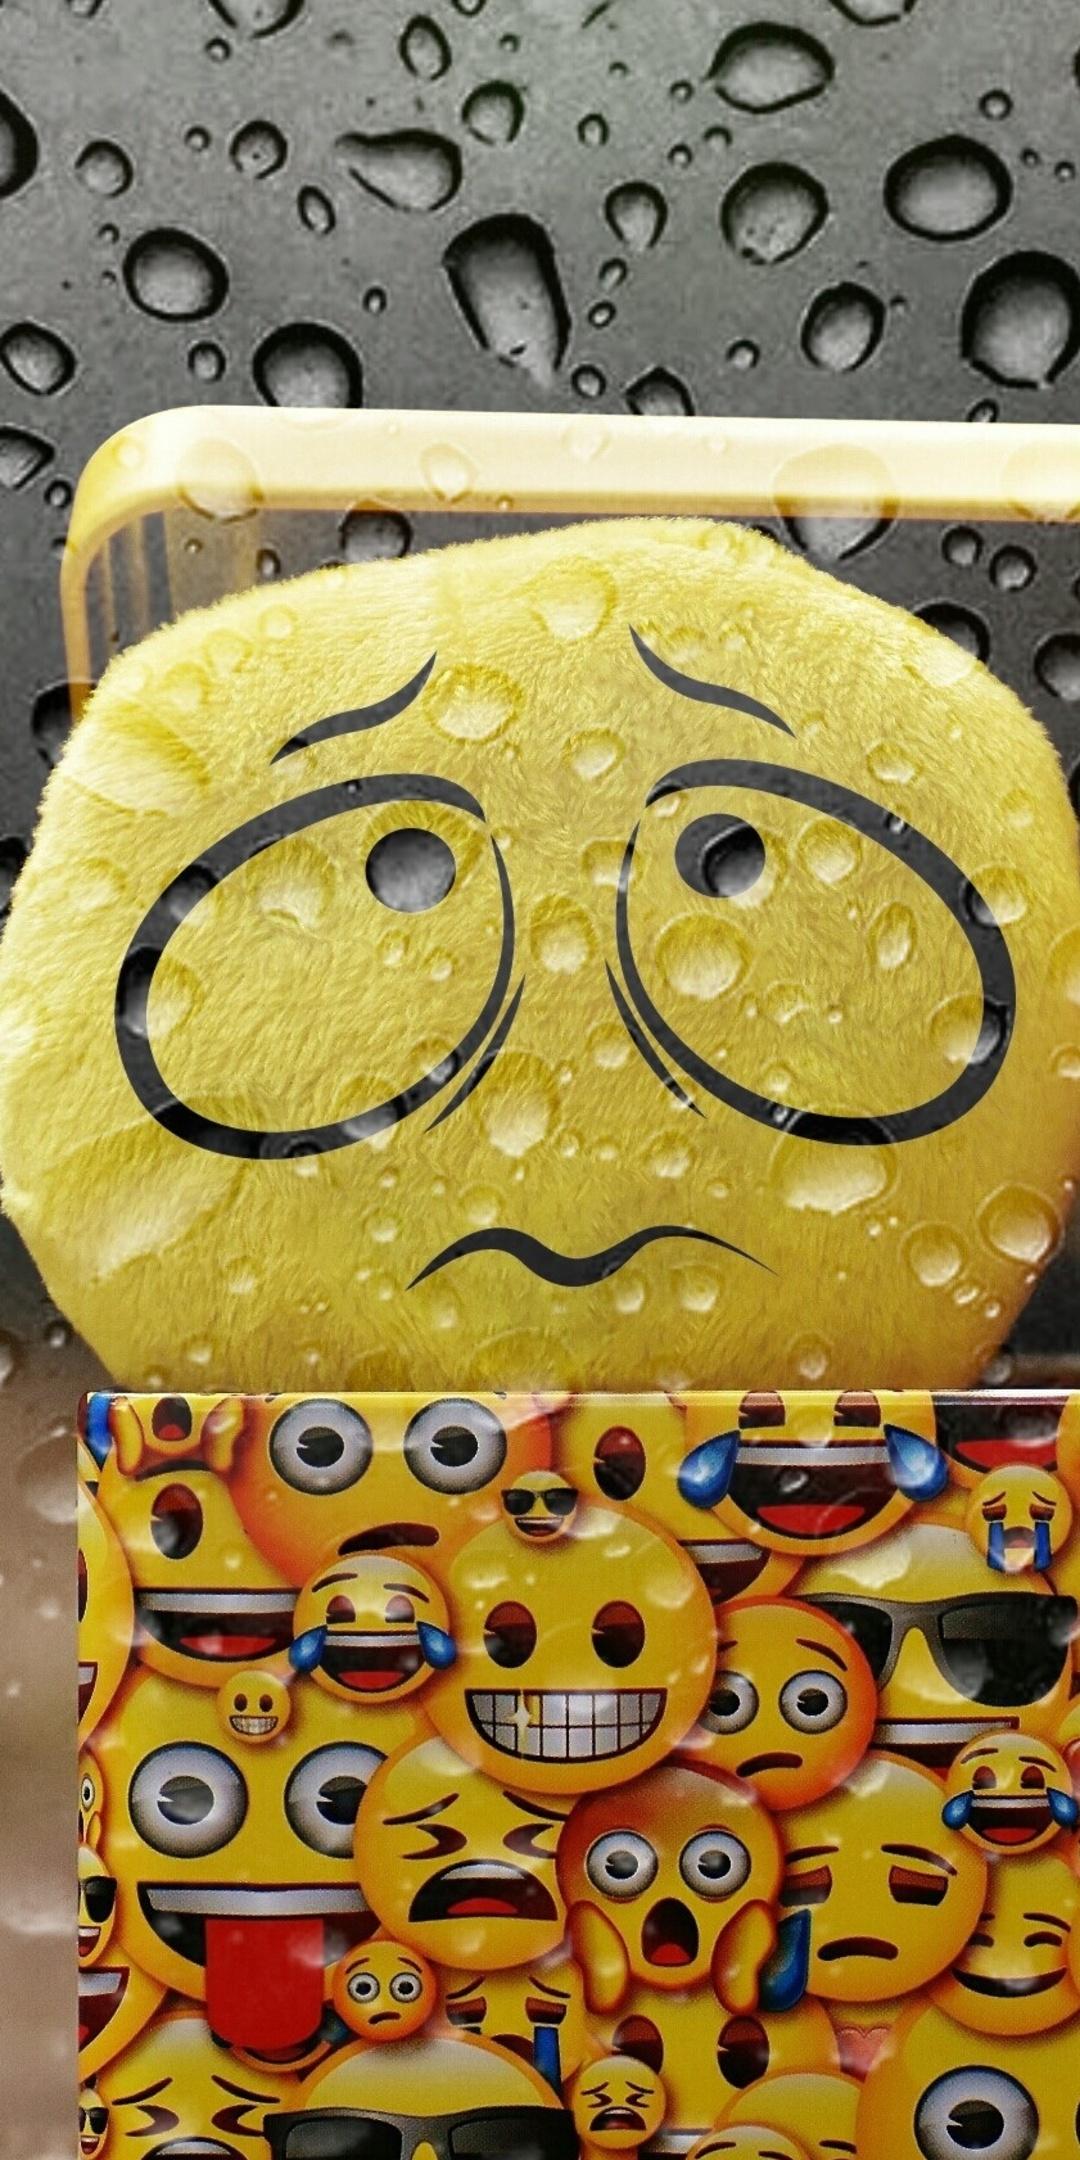 smile-cry-box-09.jpg